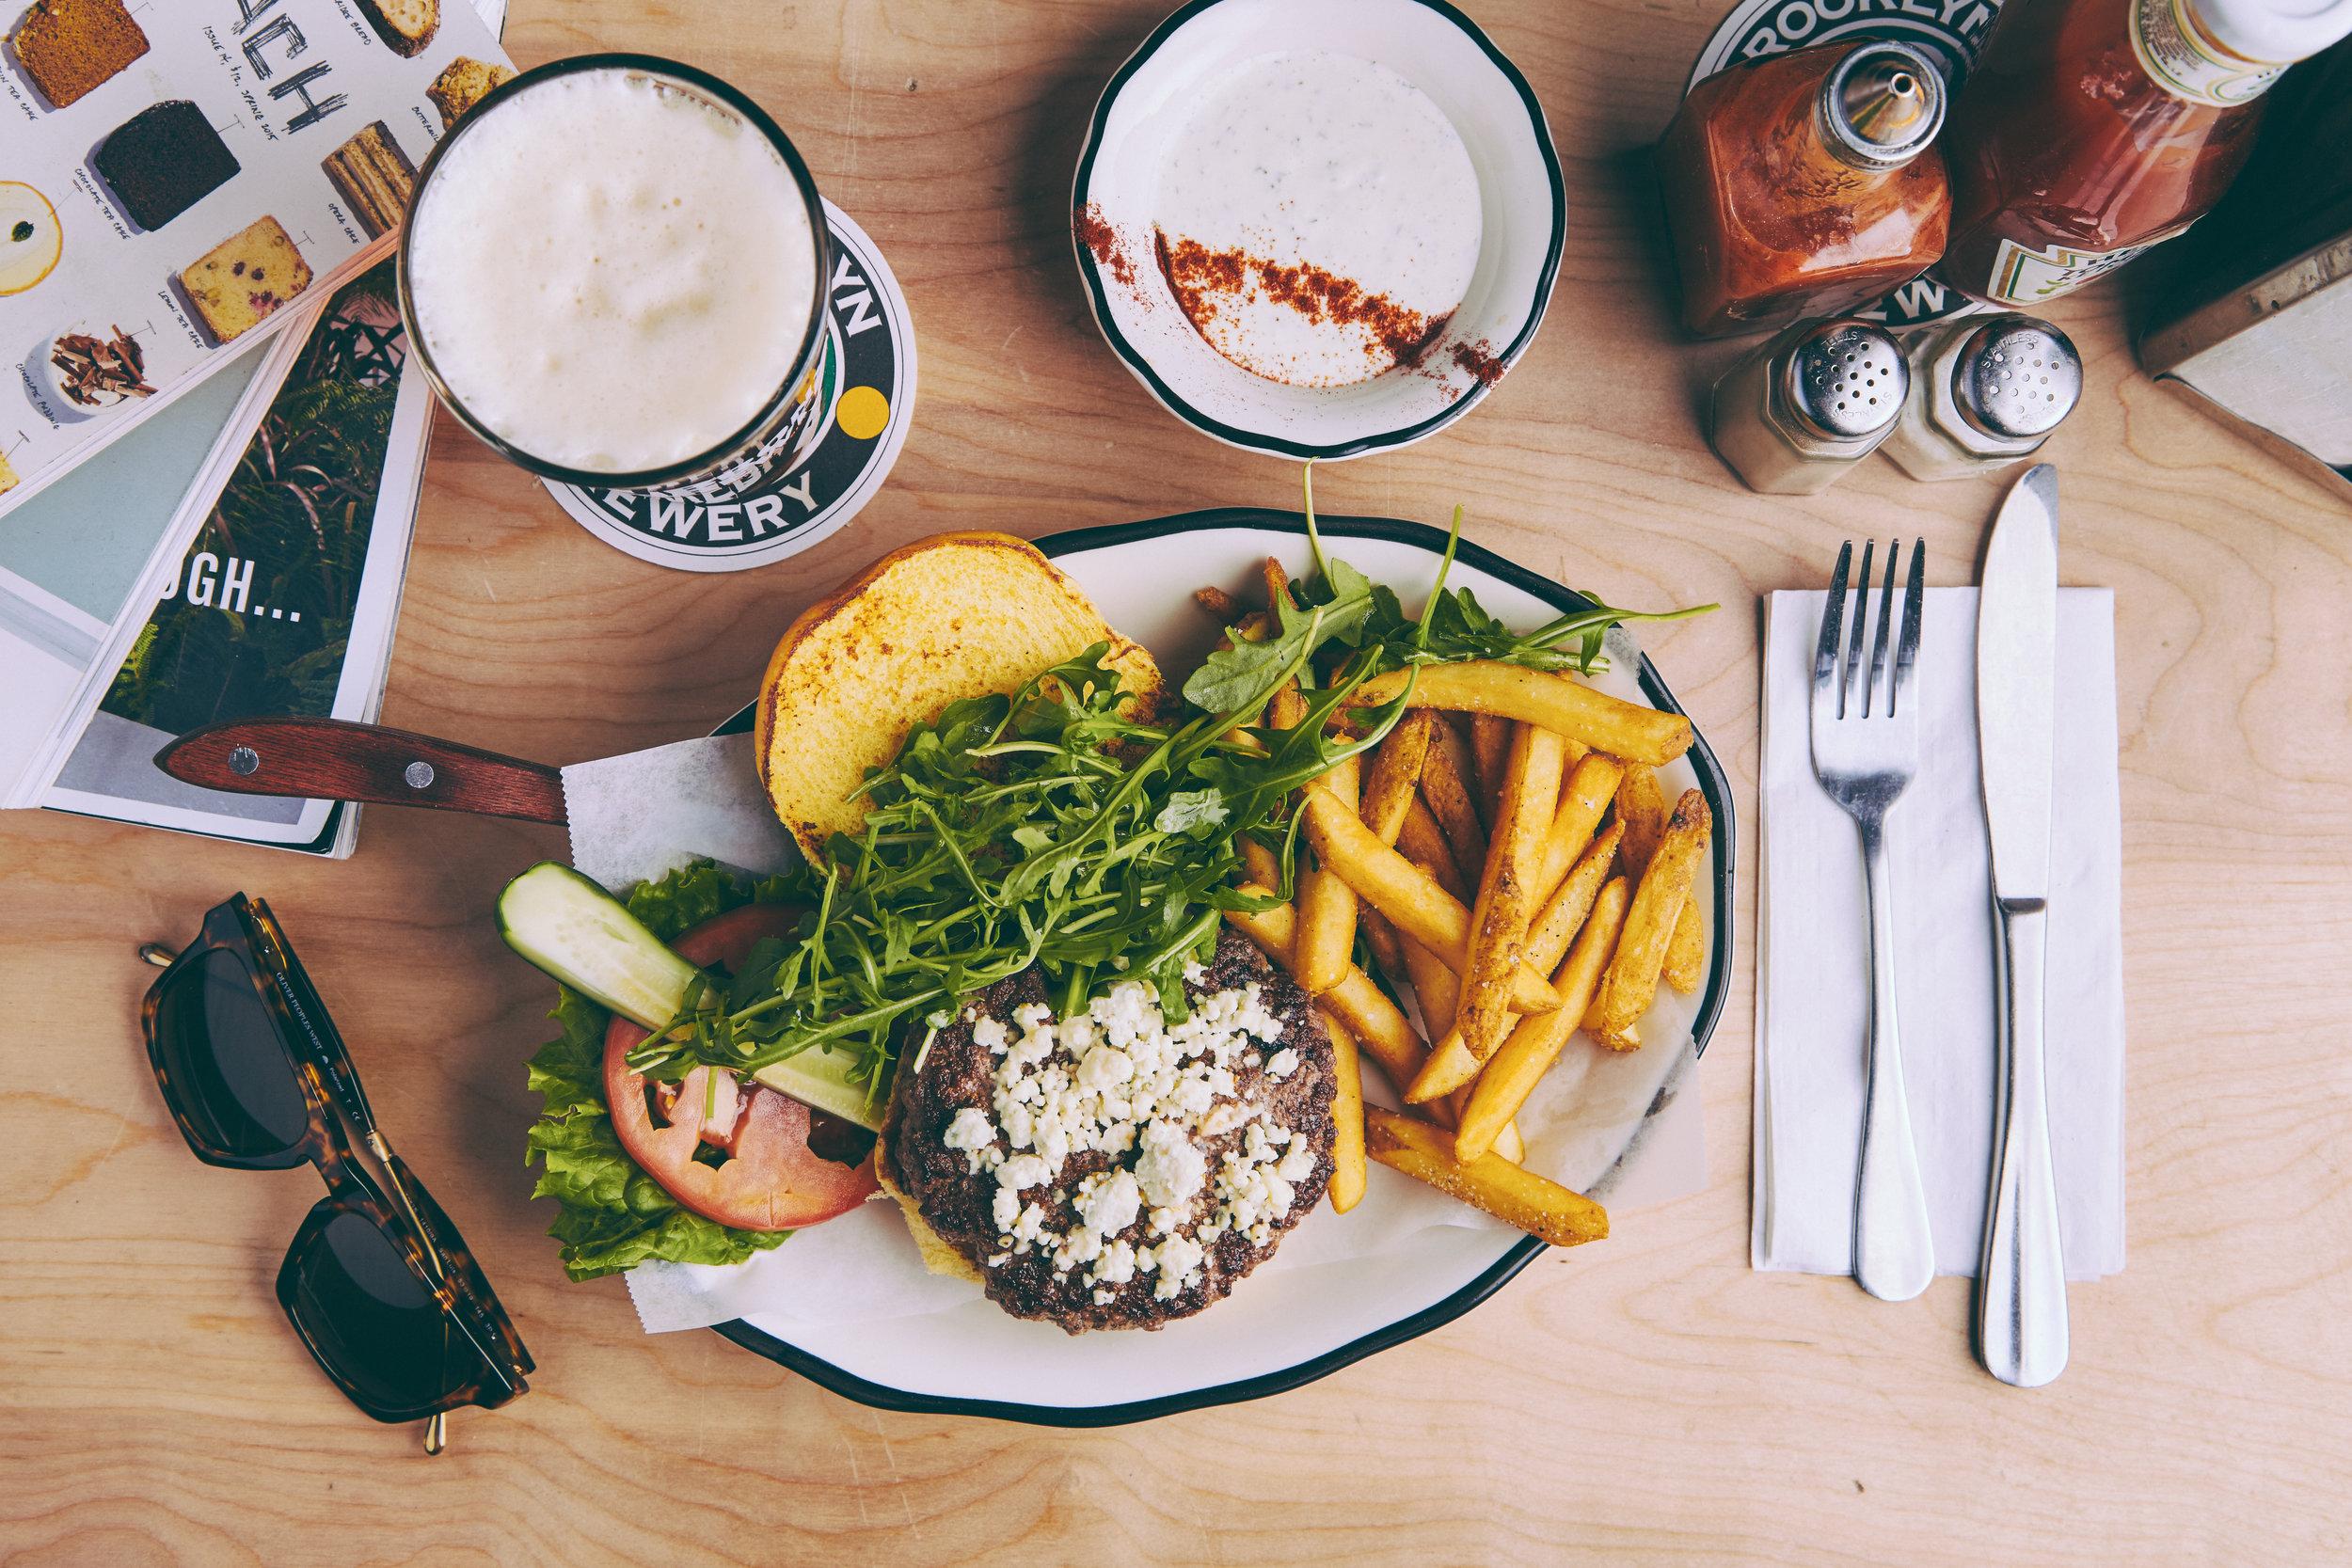 Black Tap's  Greg Norman burger, photo courtesy of Black Tap